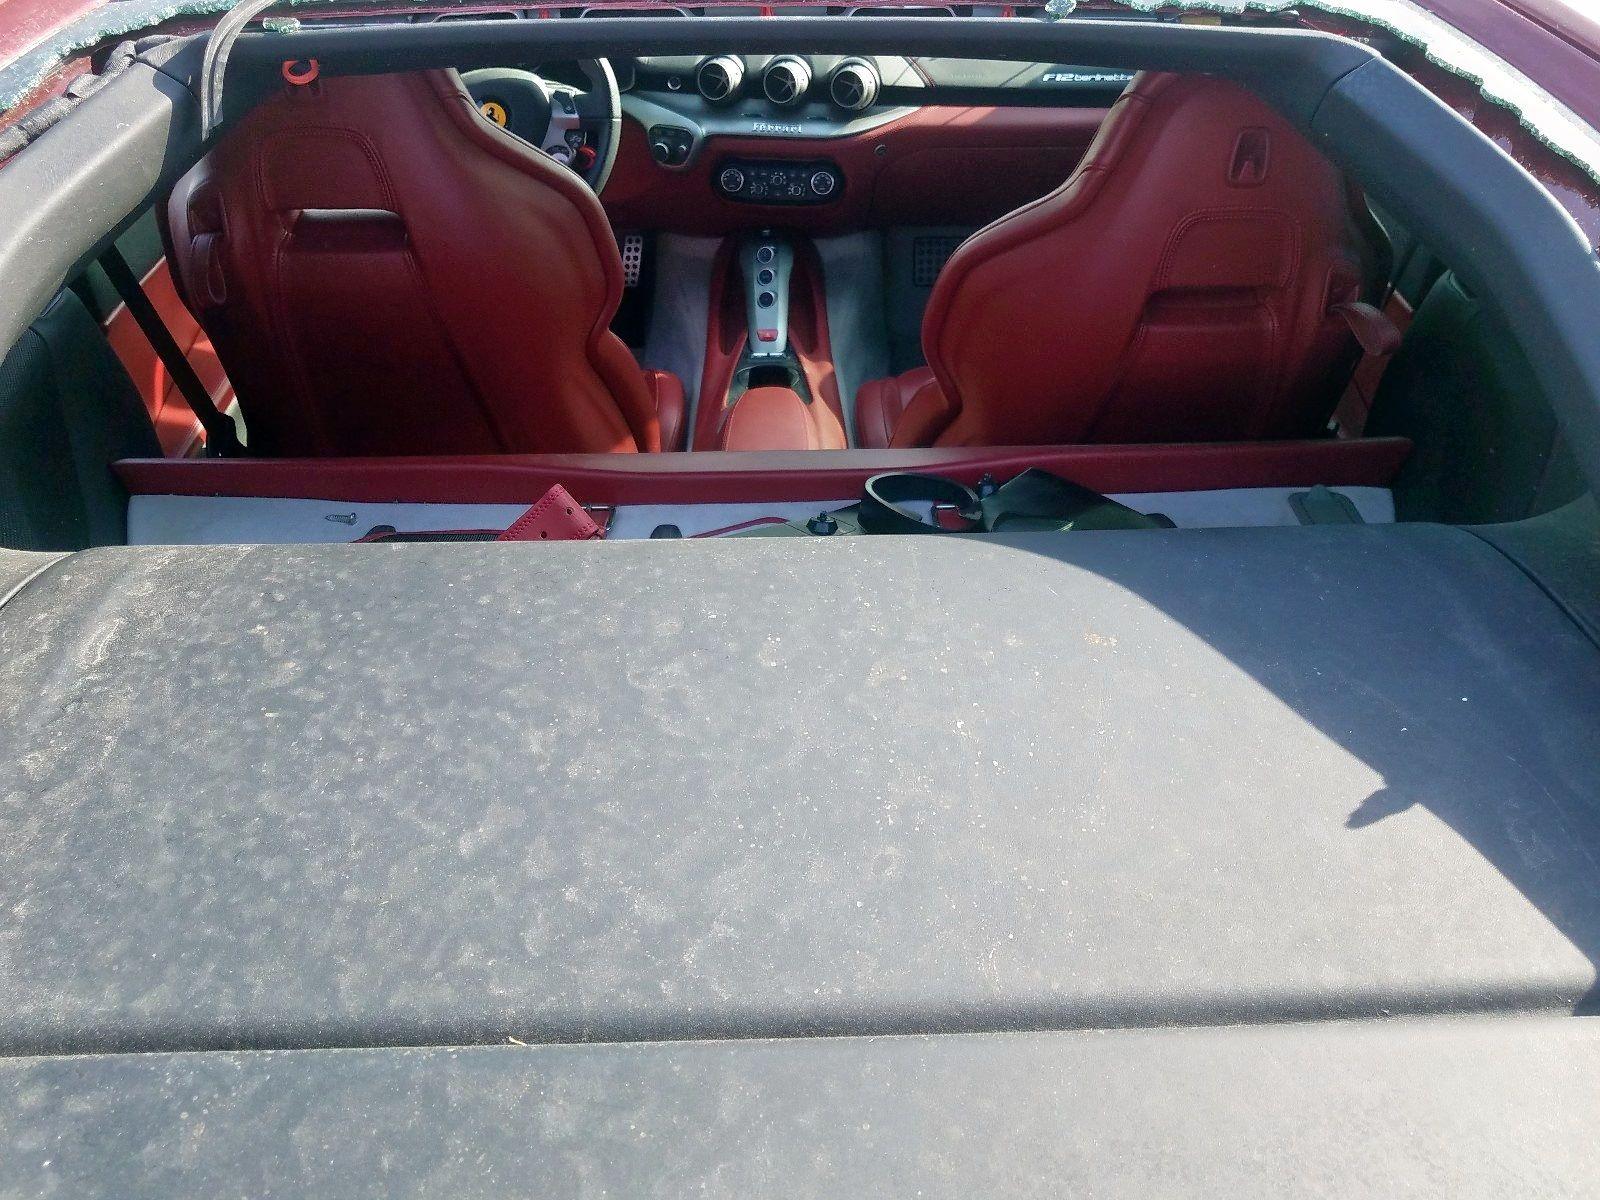 Crashed-Ferrari-F12berlinetta-for-sale-6